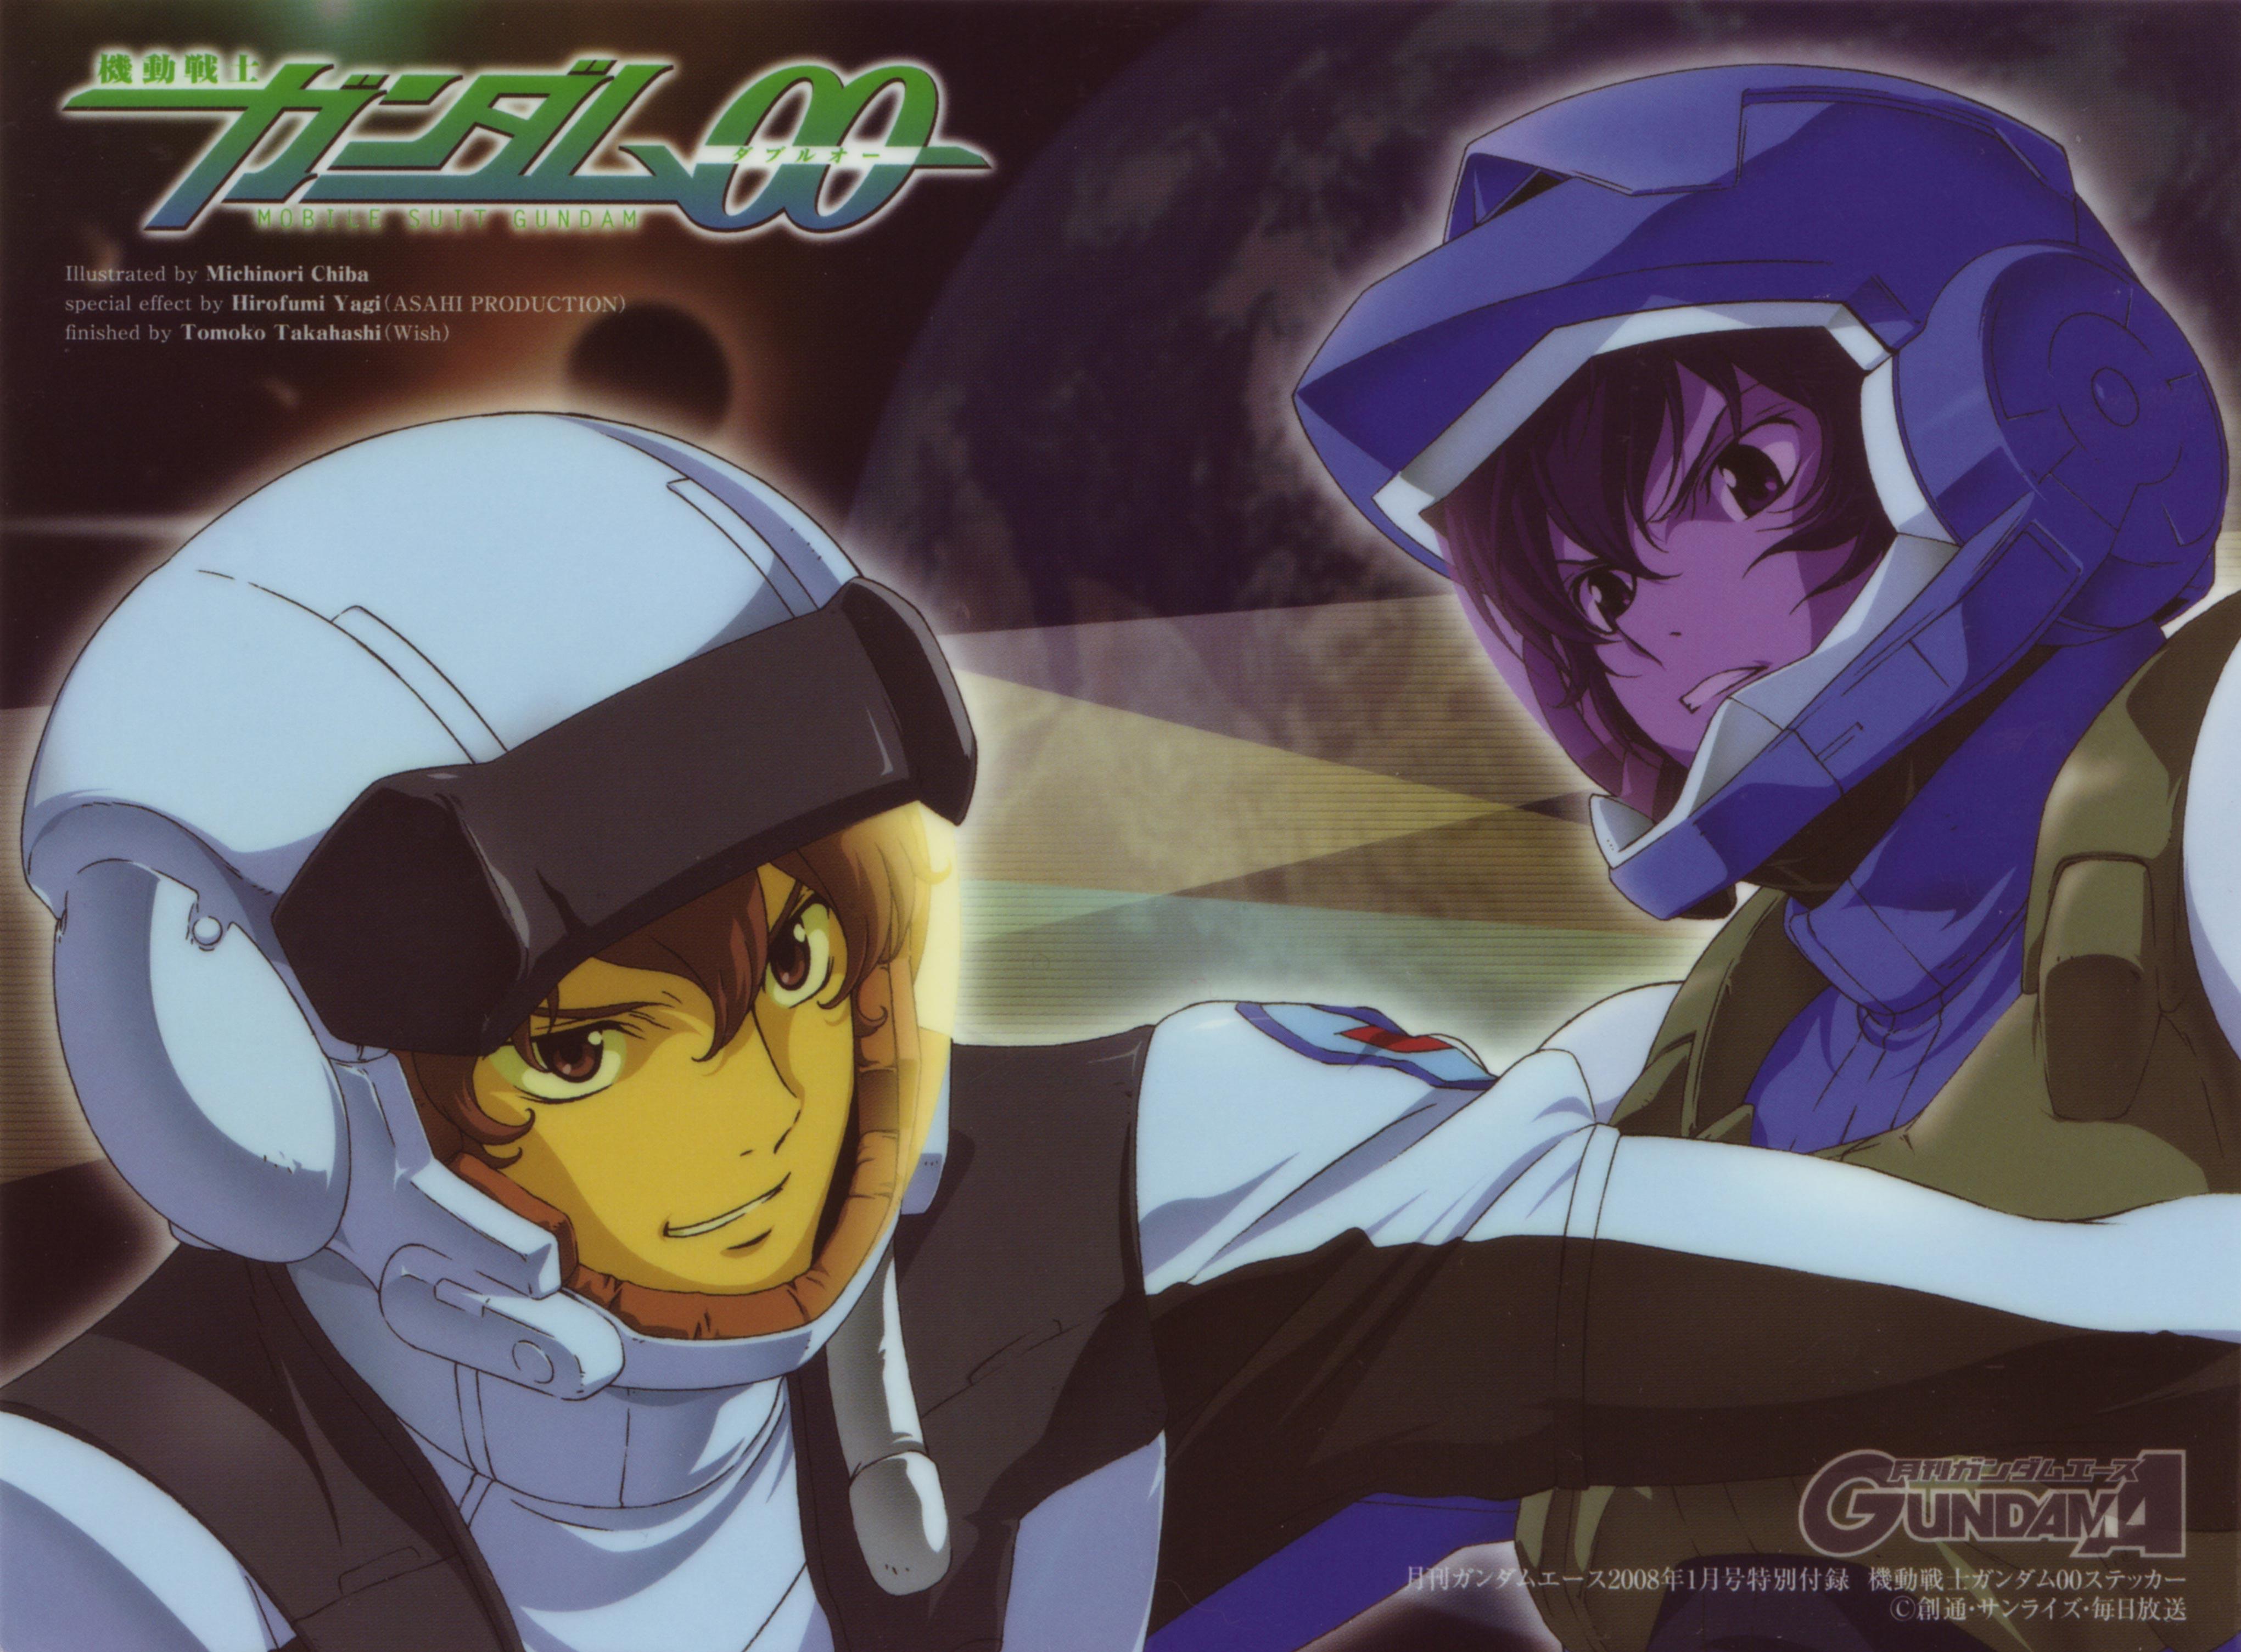 Mobile Suit Gundam 00/#119129 - Zerochan